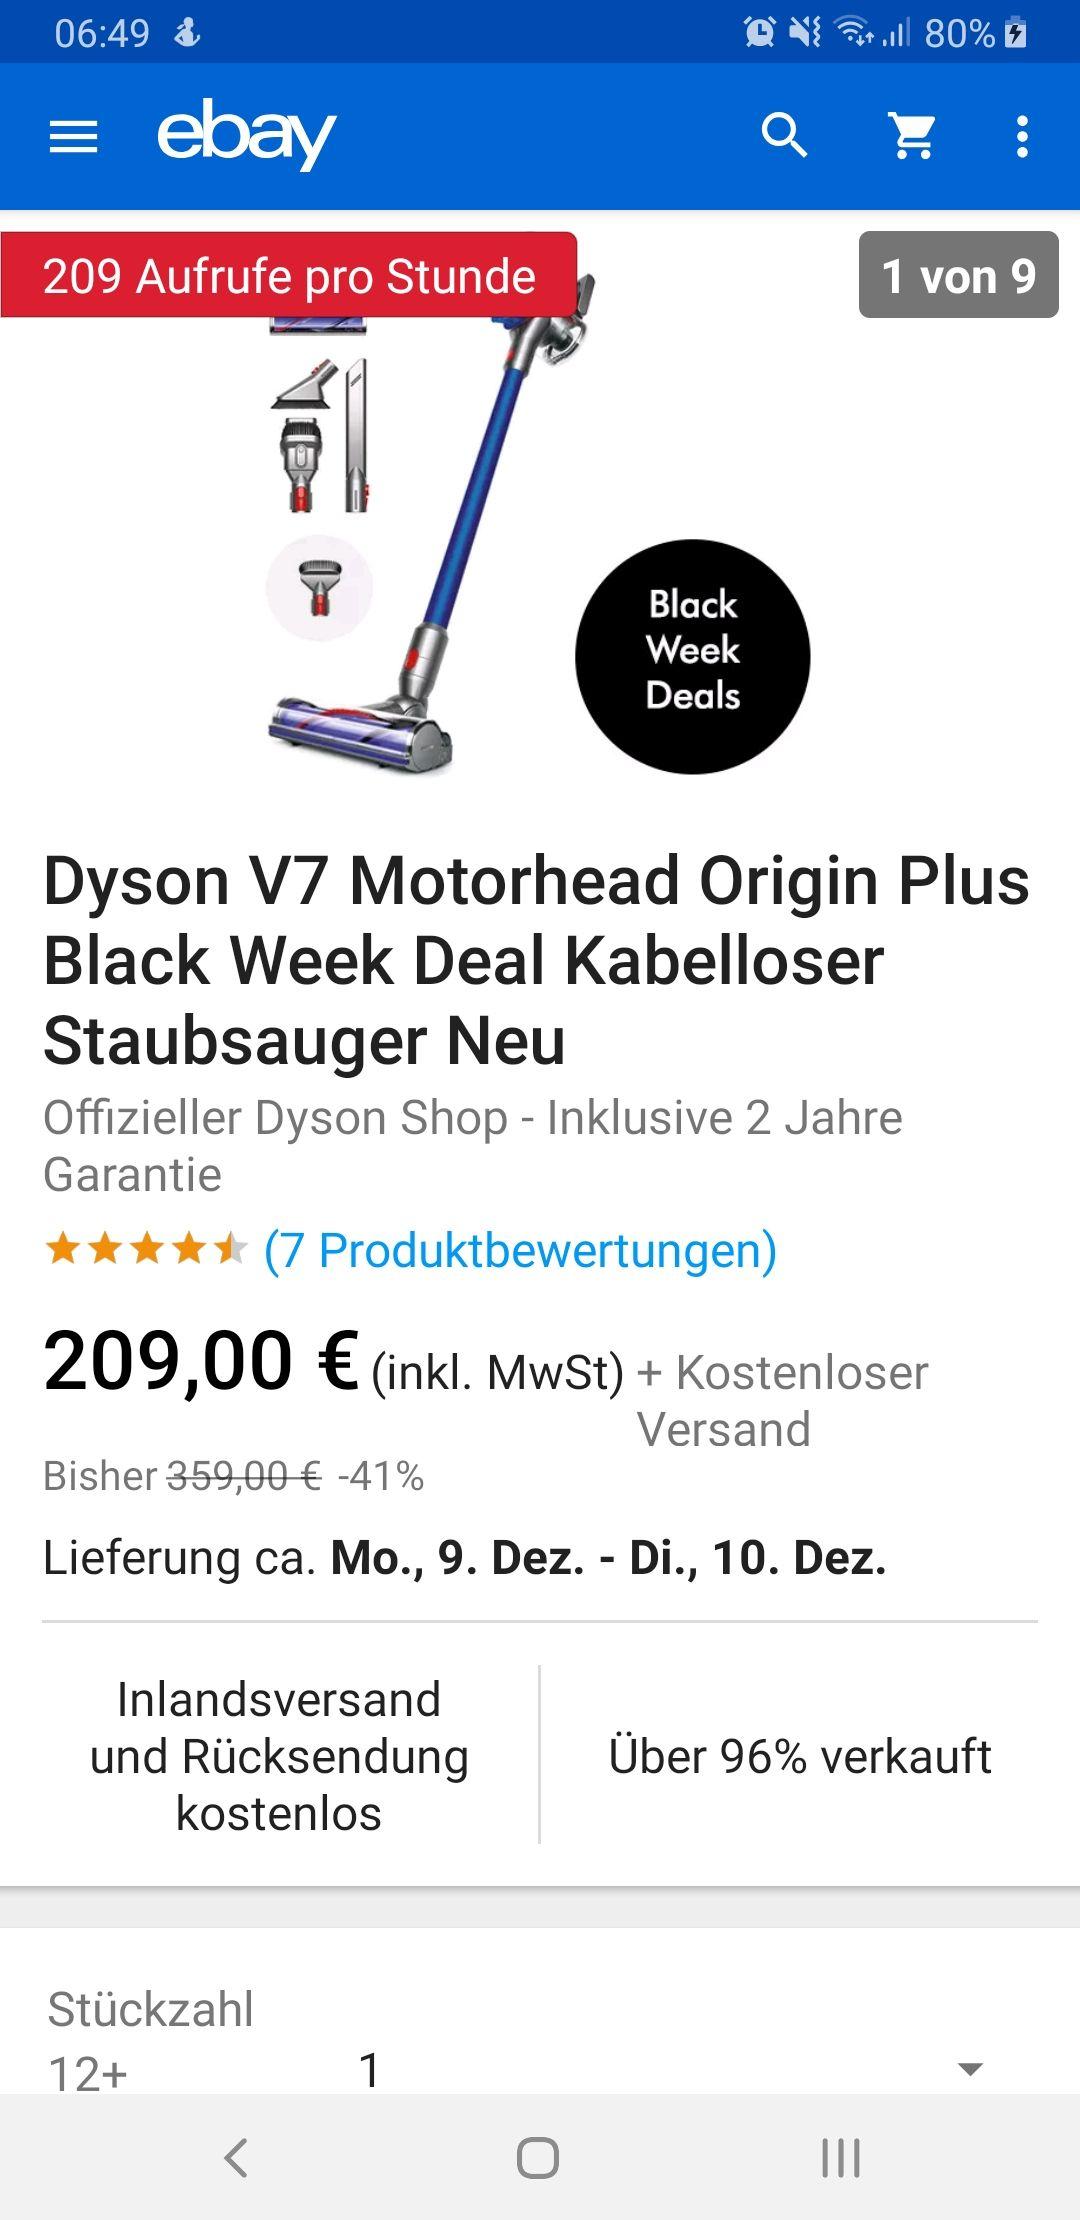 eBay - Dyson V7 Motorhead Origin Plus Black Week Deal Kabelloser Staubsauger Neu